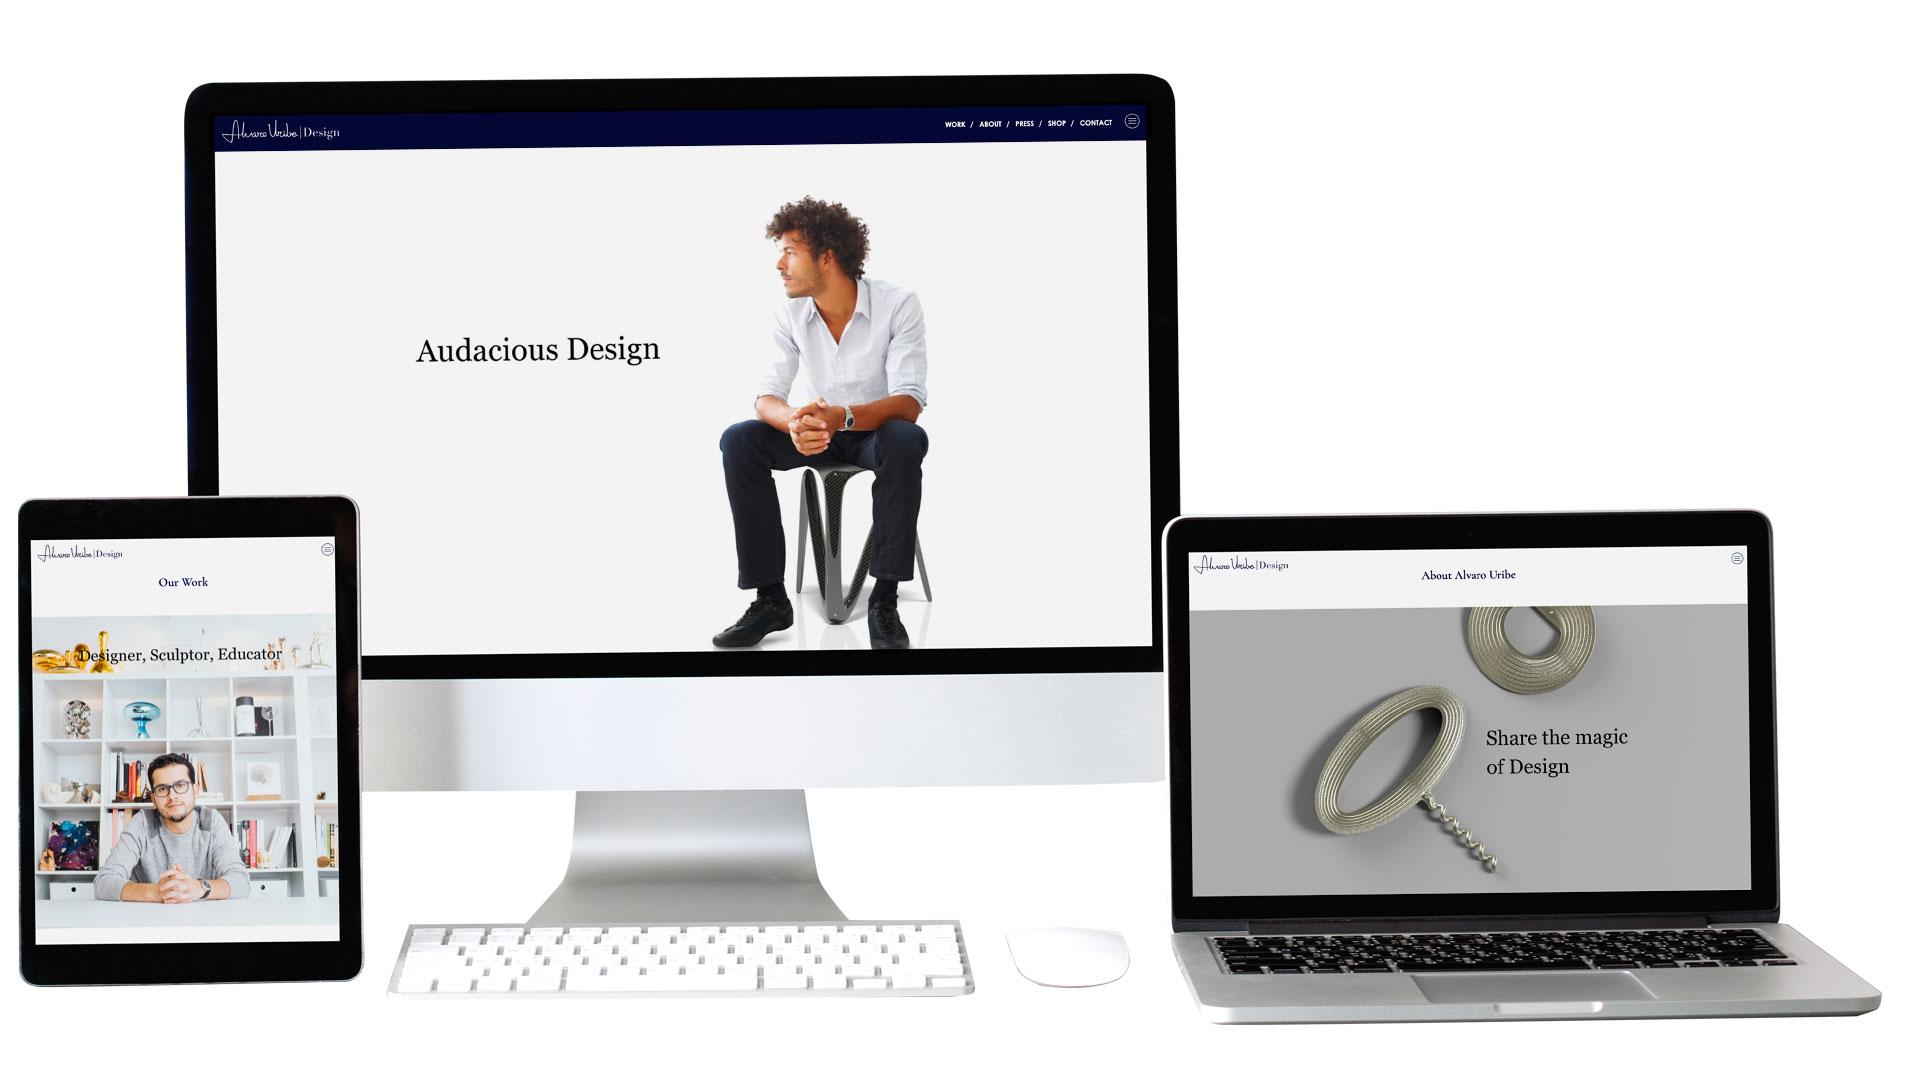 INDUSTRIAL-DESIGN-SCULPTOR-EDUCATOR-PRODUCTS-SHOPPING-ART-DEVELOPMENT-DESIGN